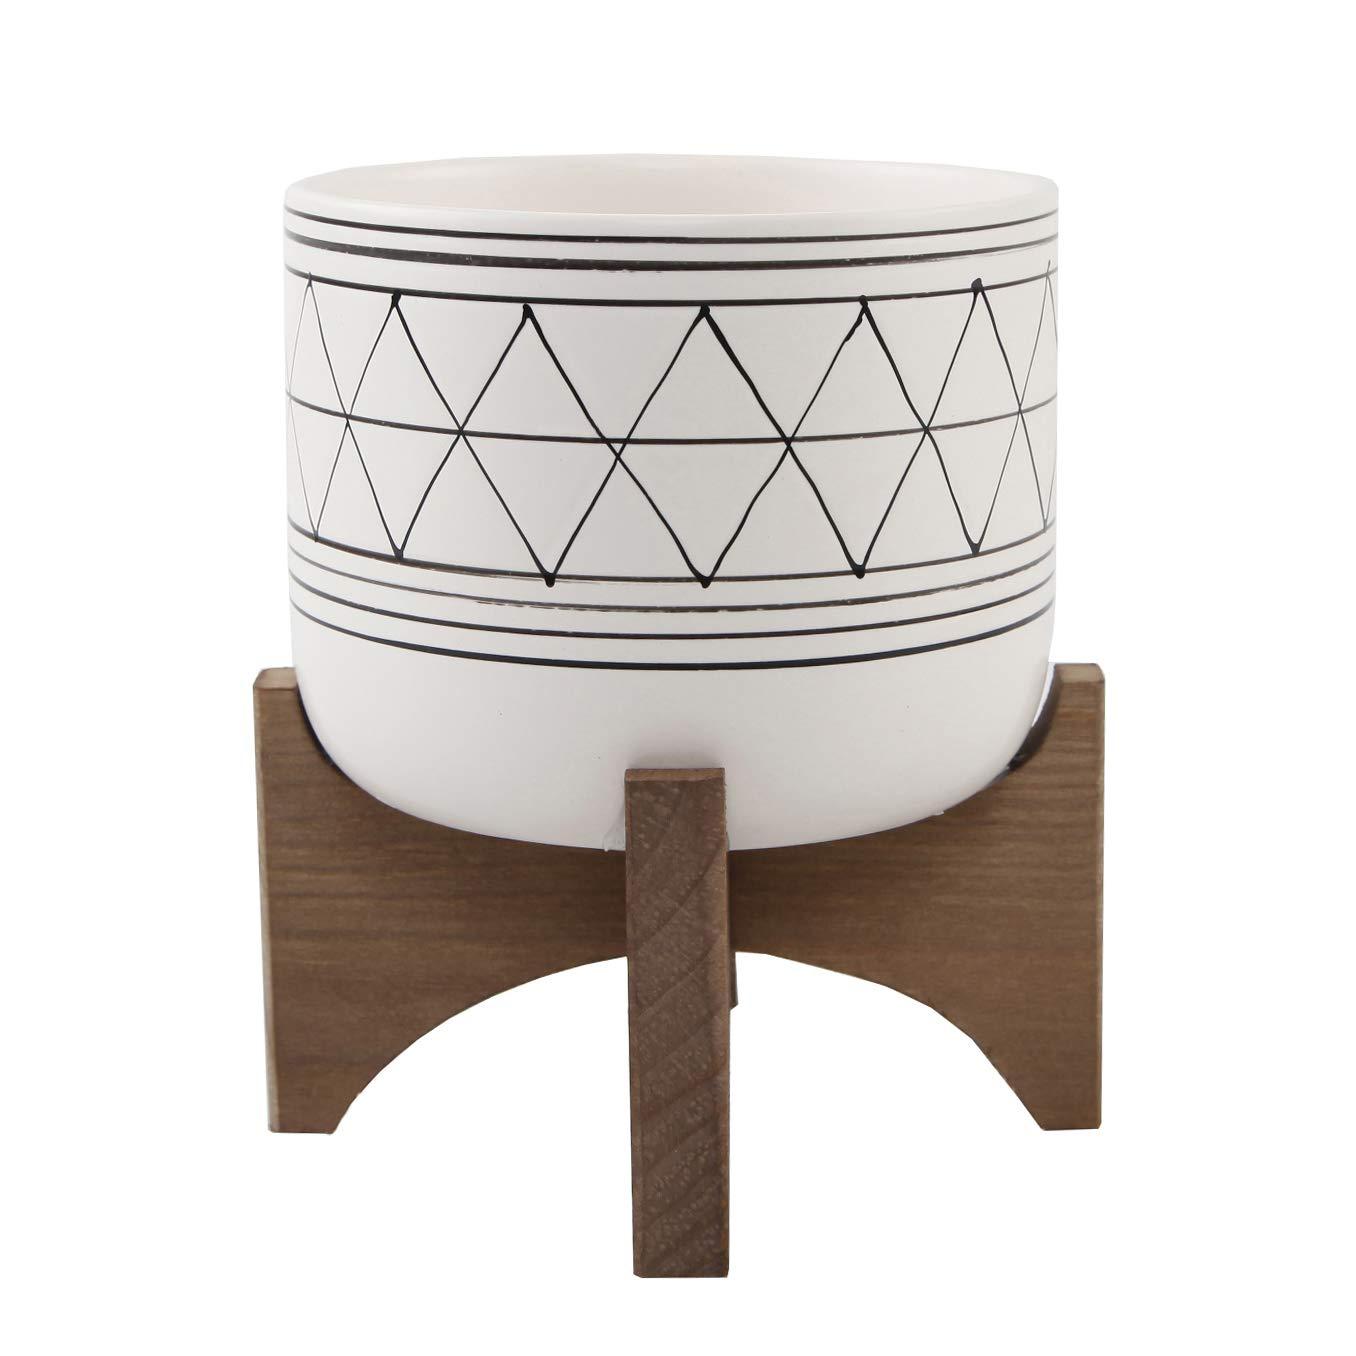 Flora Bunda 5 White Black Ceramic Geometric W Wood Stand Planter Mid Century